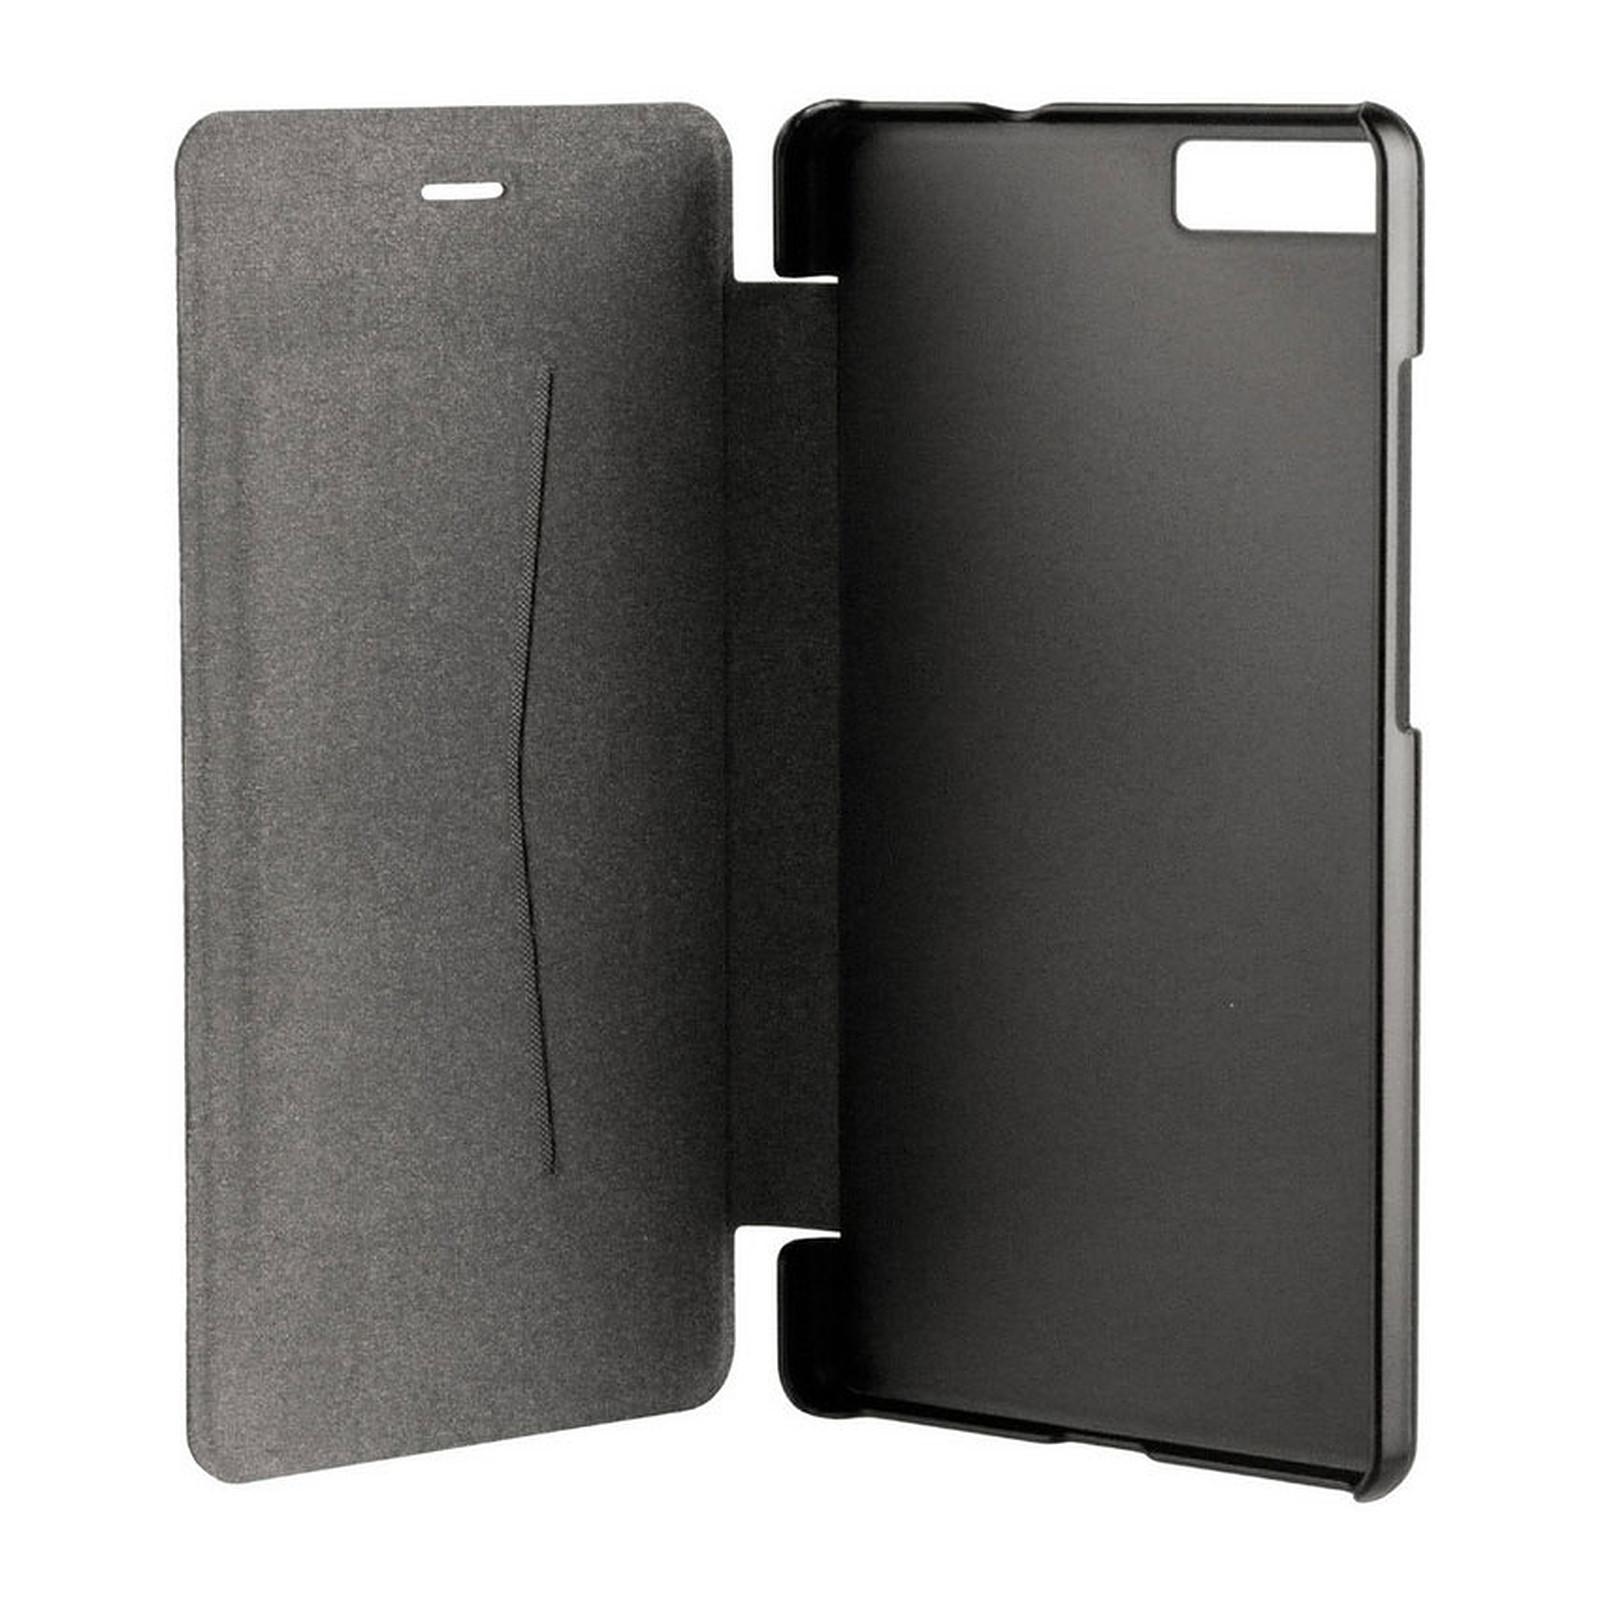 xqisit Etui Folio Rana Noir Huawei P8 Lite